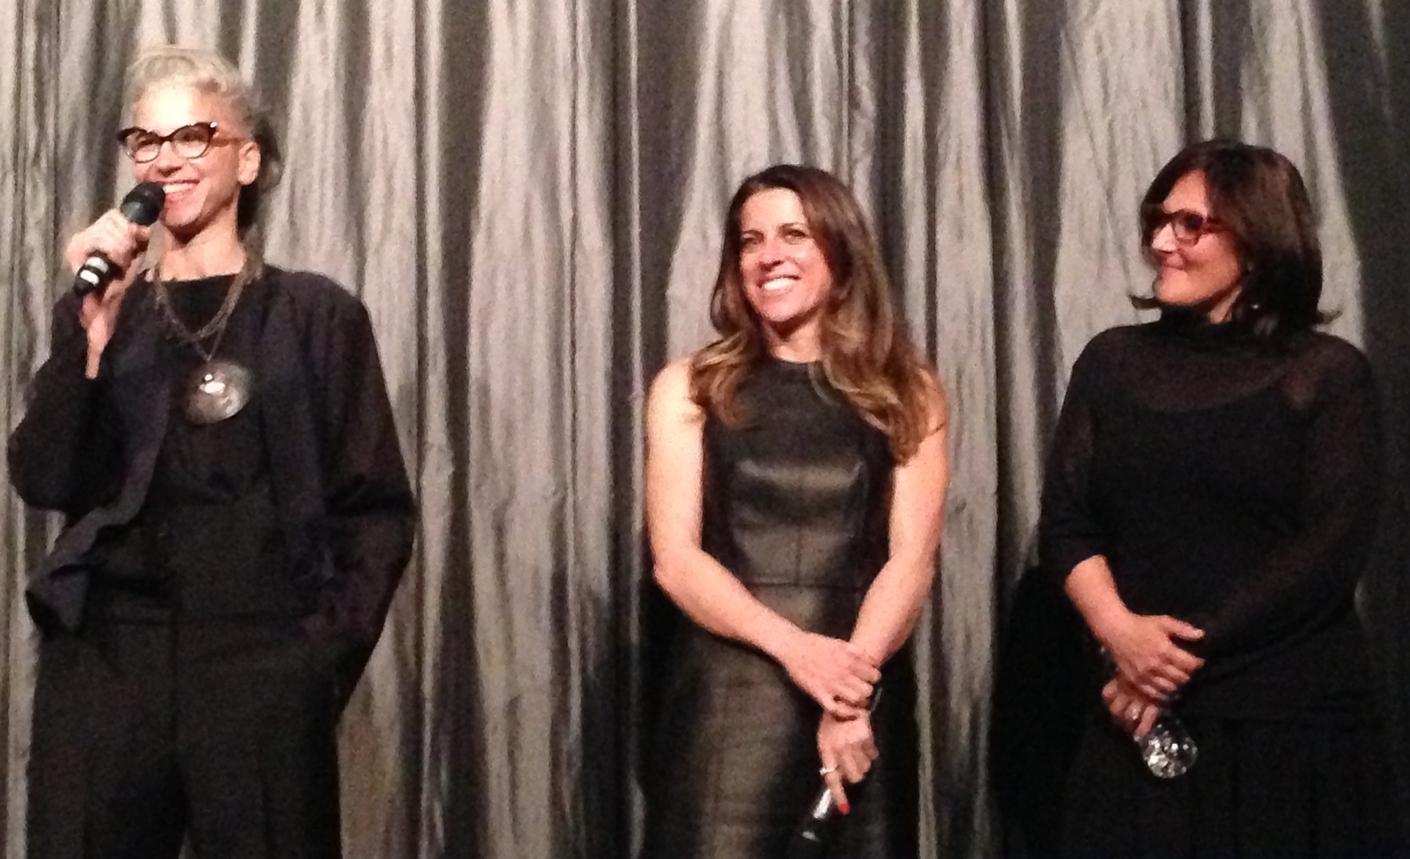 From left to right: Dana Ben-Ari,Abby Epstein and  Ricki Lake